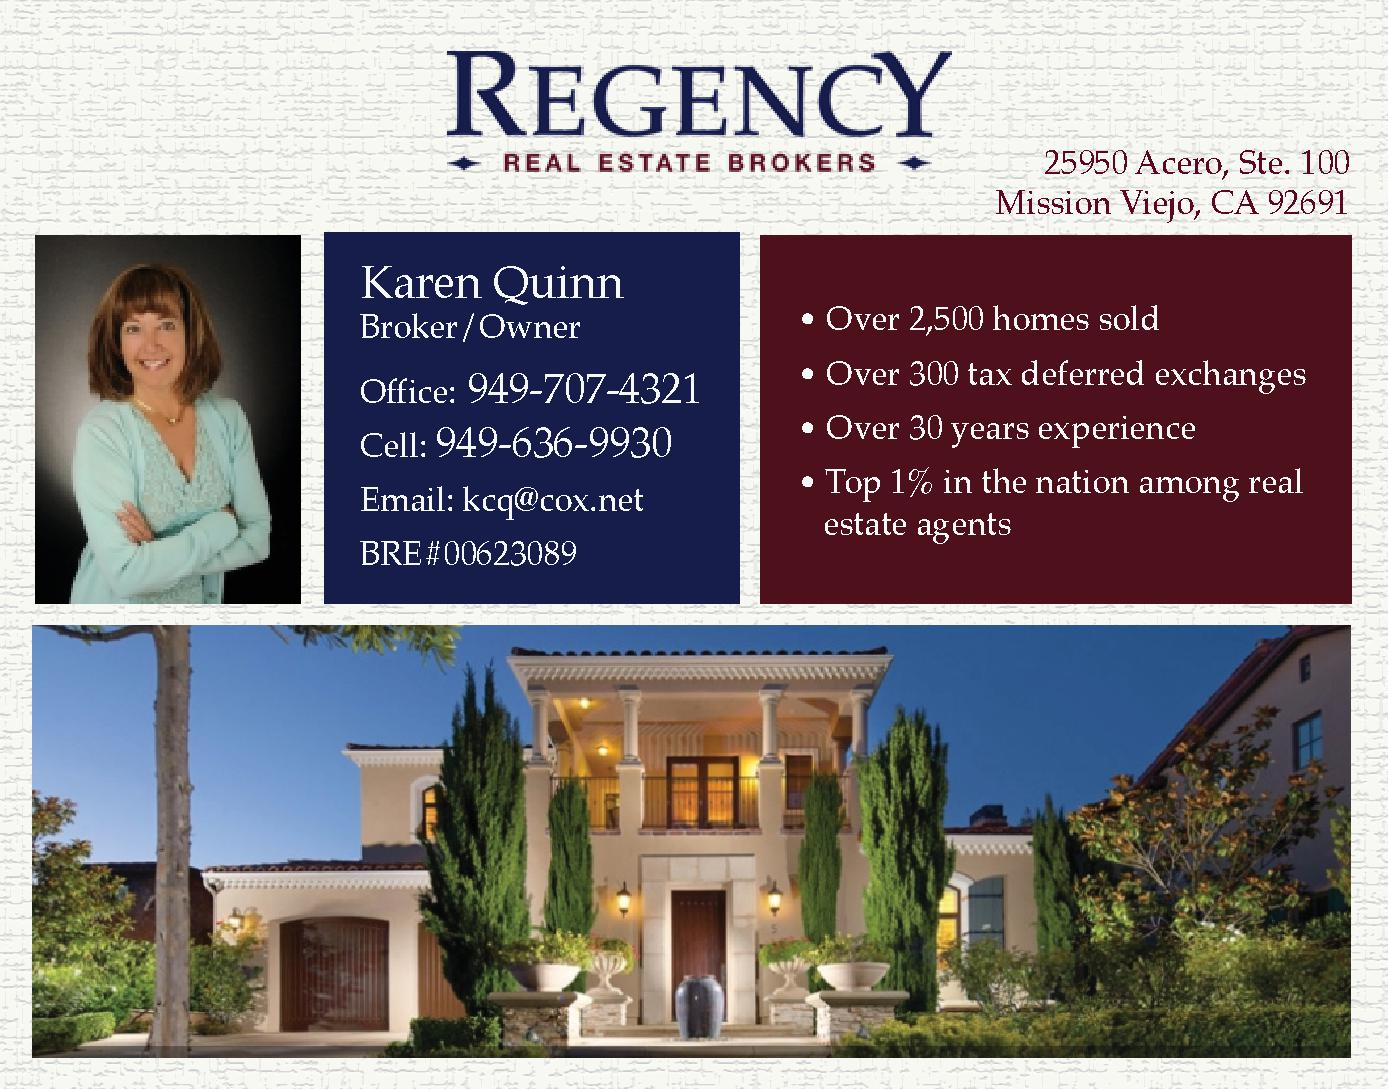 Regency Real Estate Brokers - Quinn